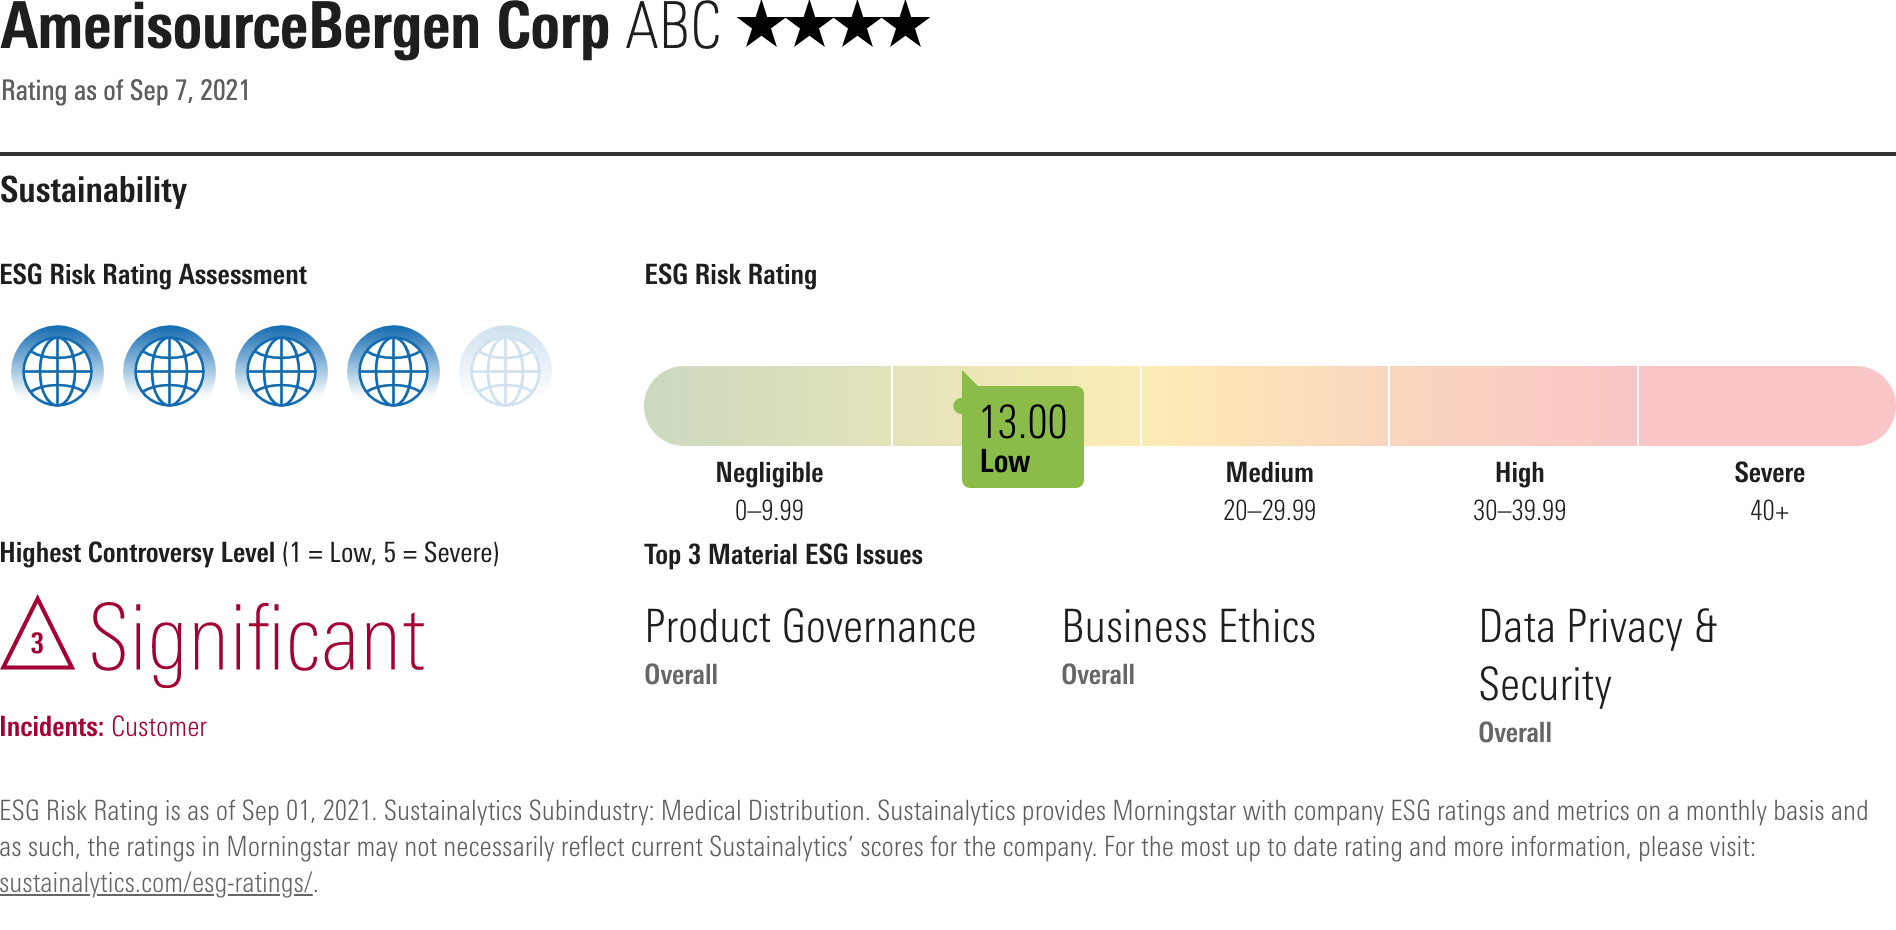 AmerisourceBergen Corp